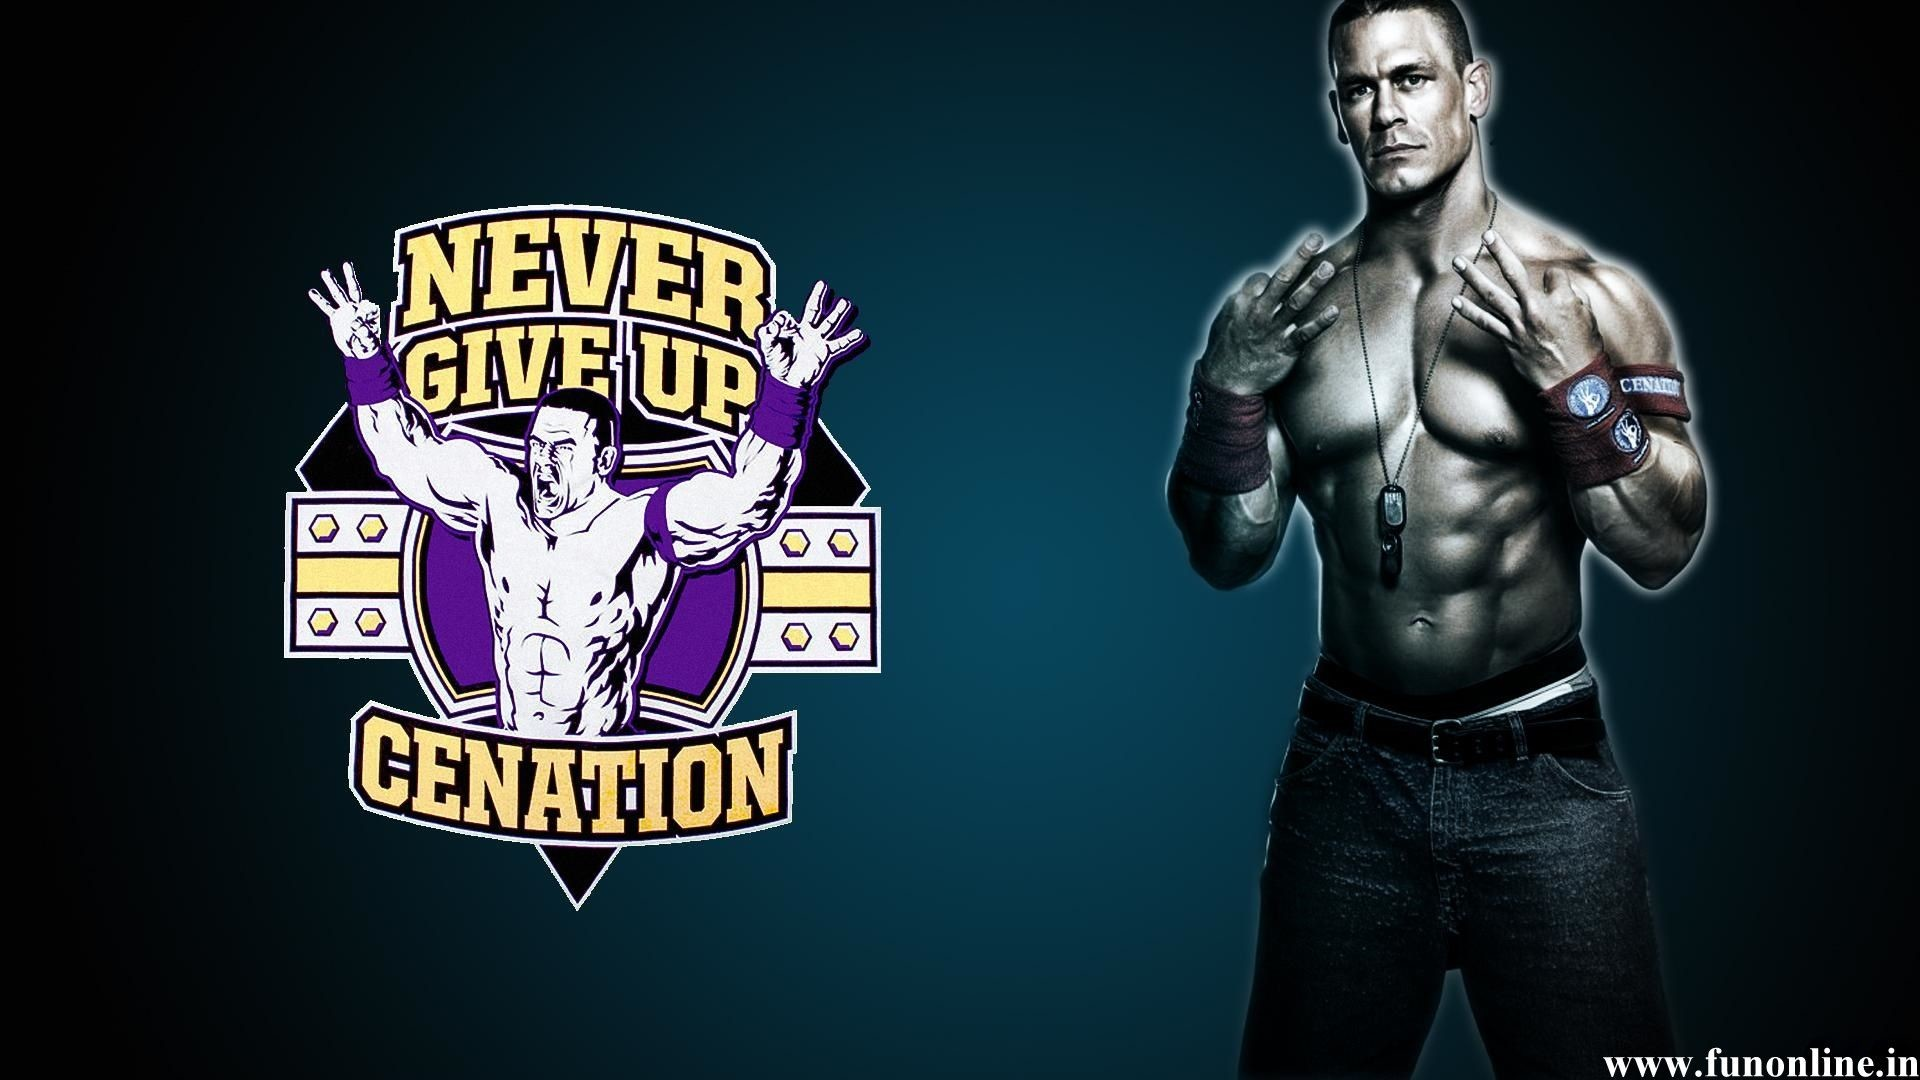 John Cena Wallpapers, Download WWE John Cenas HD Wallpaper Free